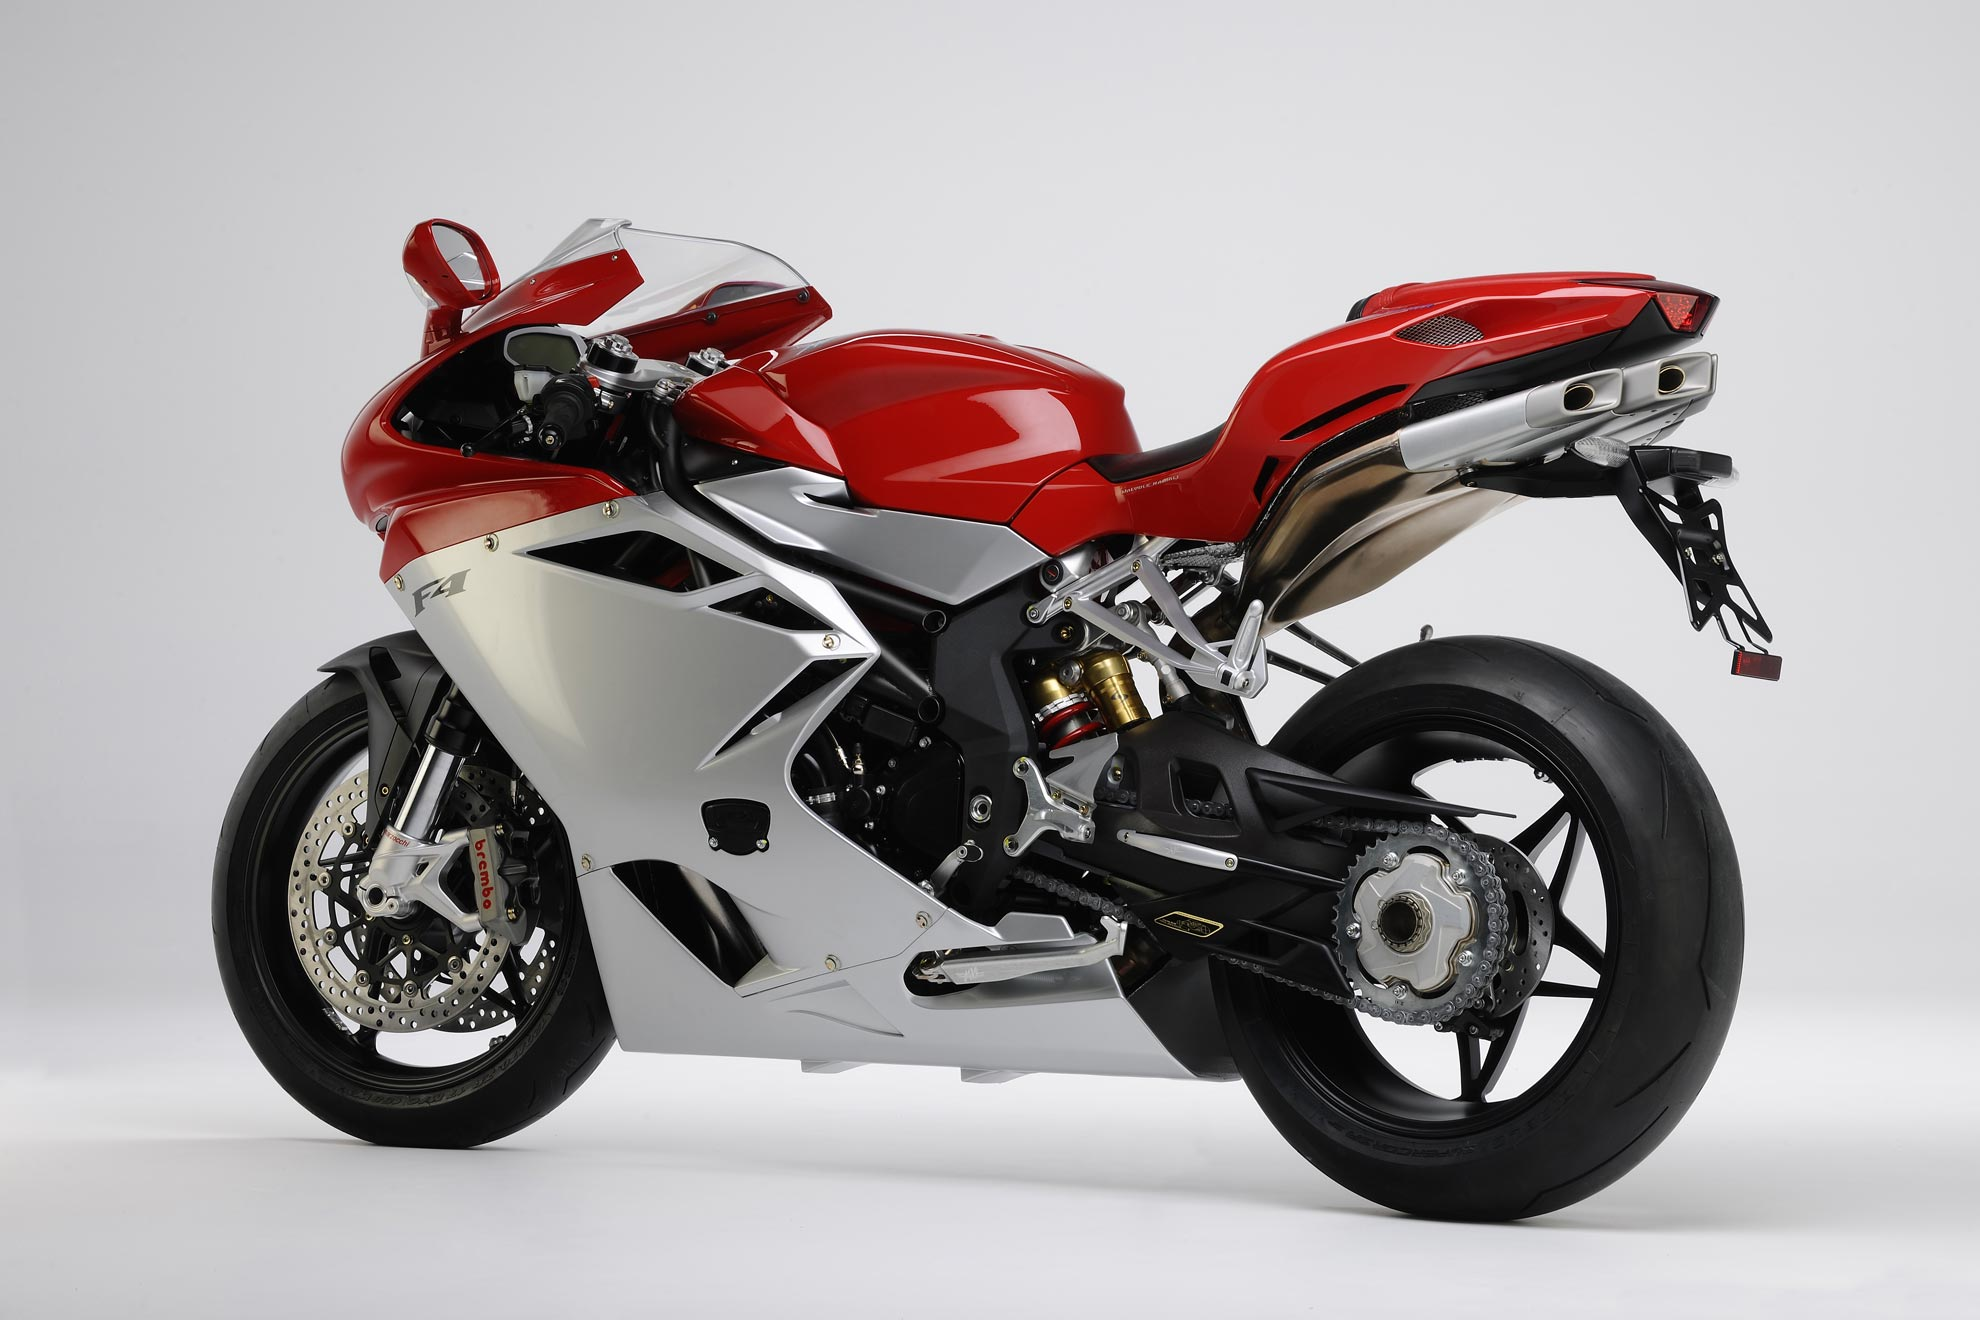 MV AGUSTA F4 - Motorcycles Photo (31363463) - Fanpop